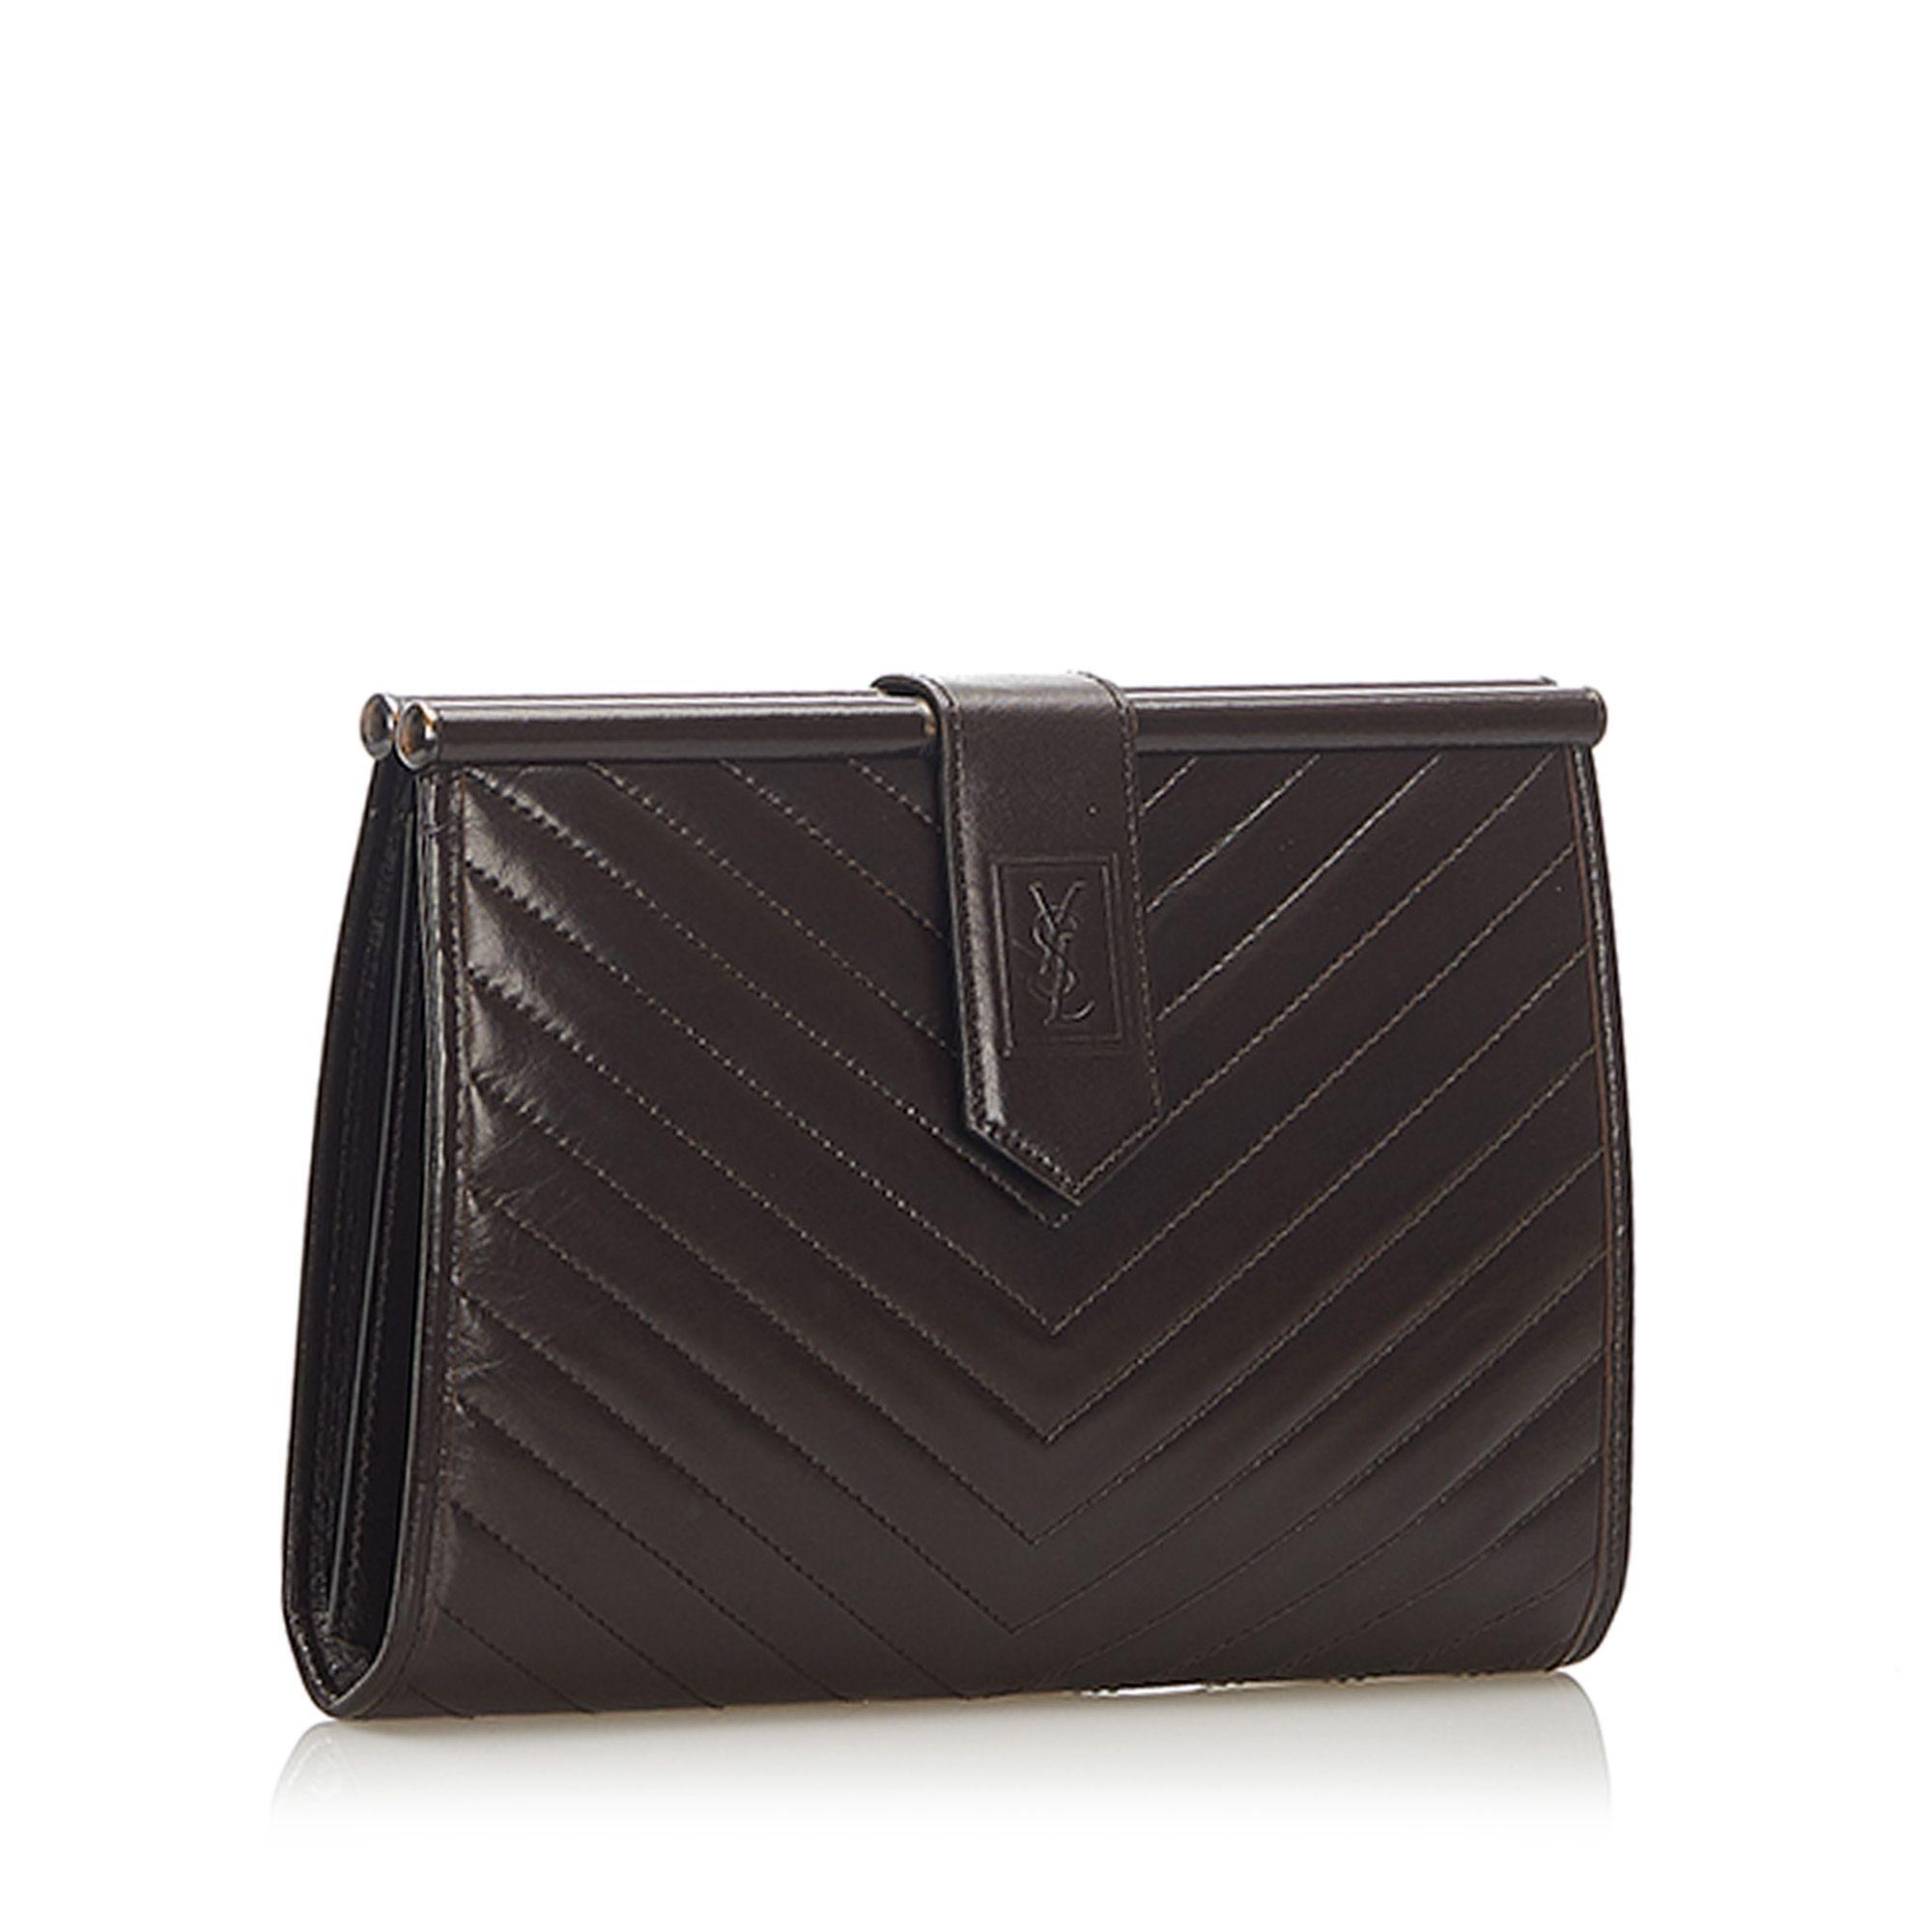 Vintage YSL Chevron Leather Clutch Bag Brown